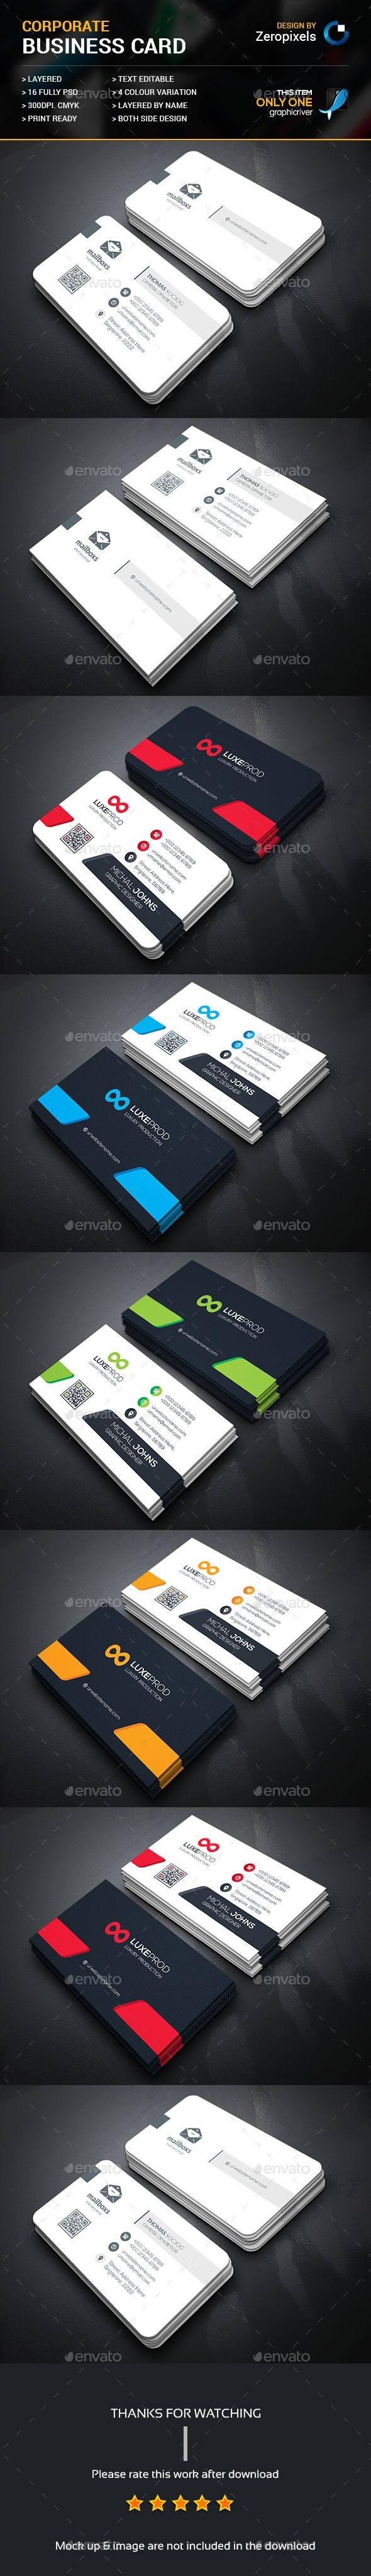 Business Card Bundle Templates PSD. Download here: http://graphicriver.net/item/business-card-bundle/16386105?ref=ksioks